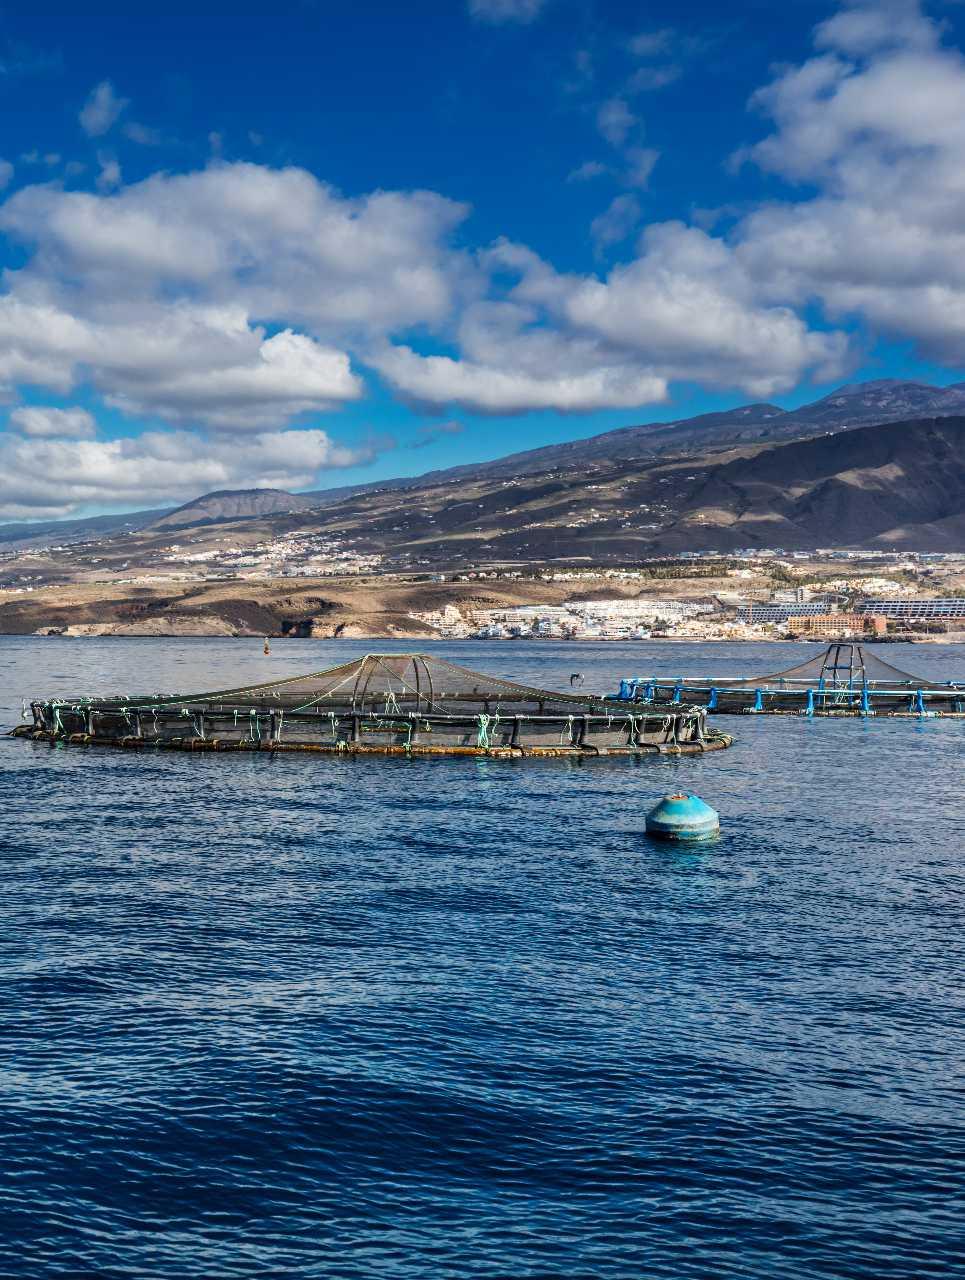 Acuicultura en el mar